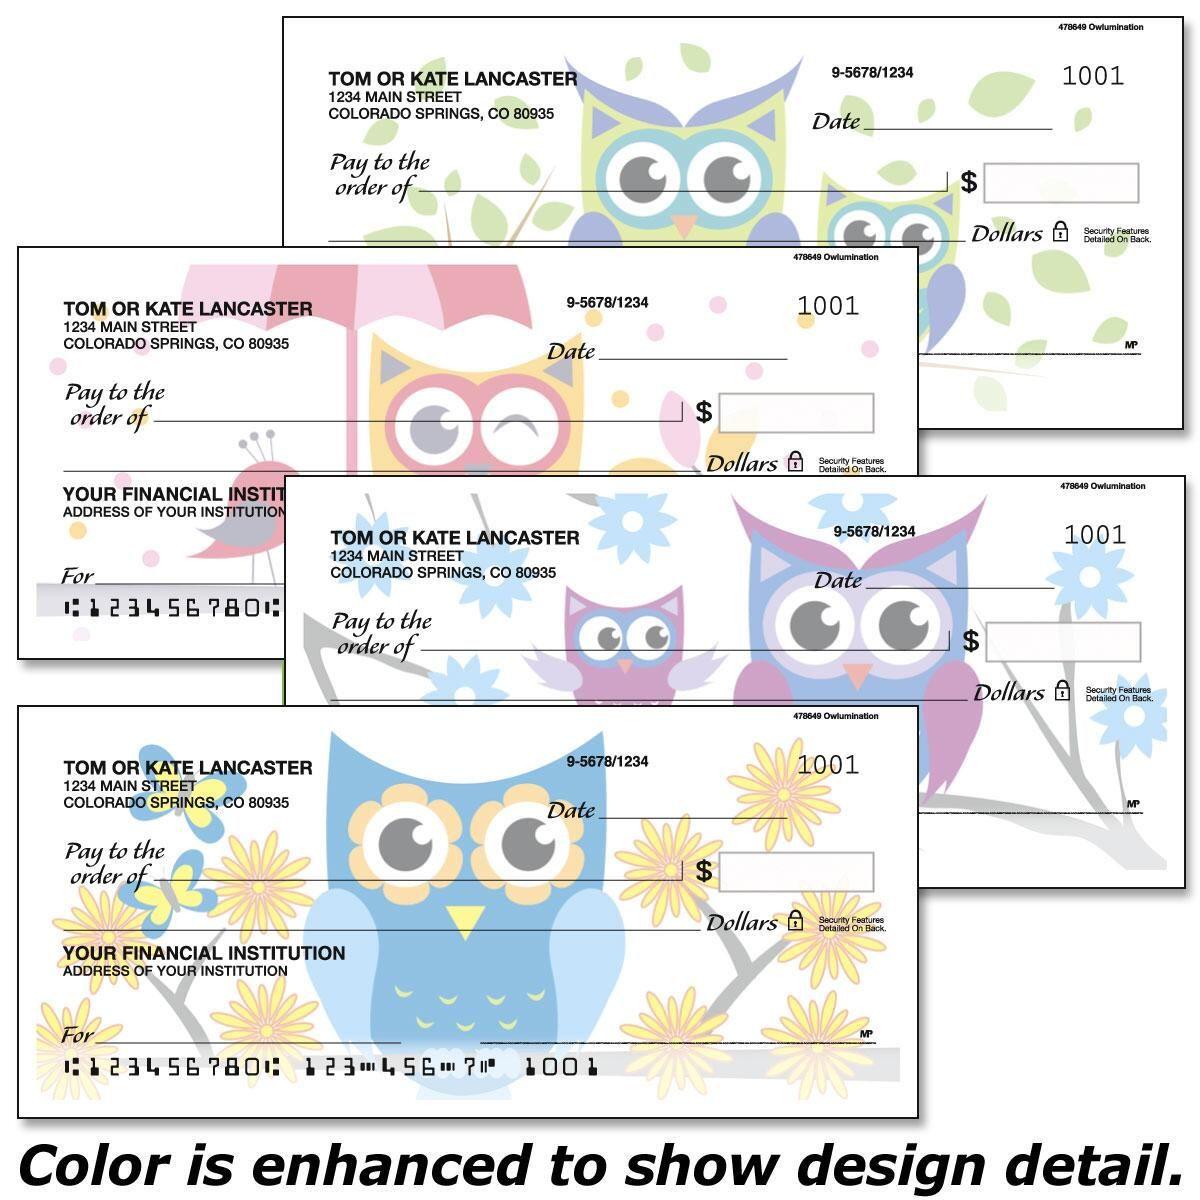 Owluminations Duplicate Checks